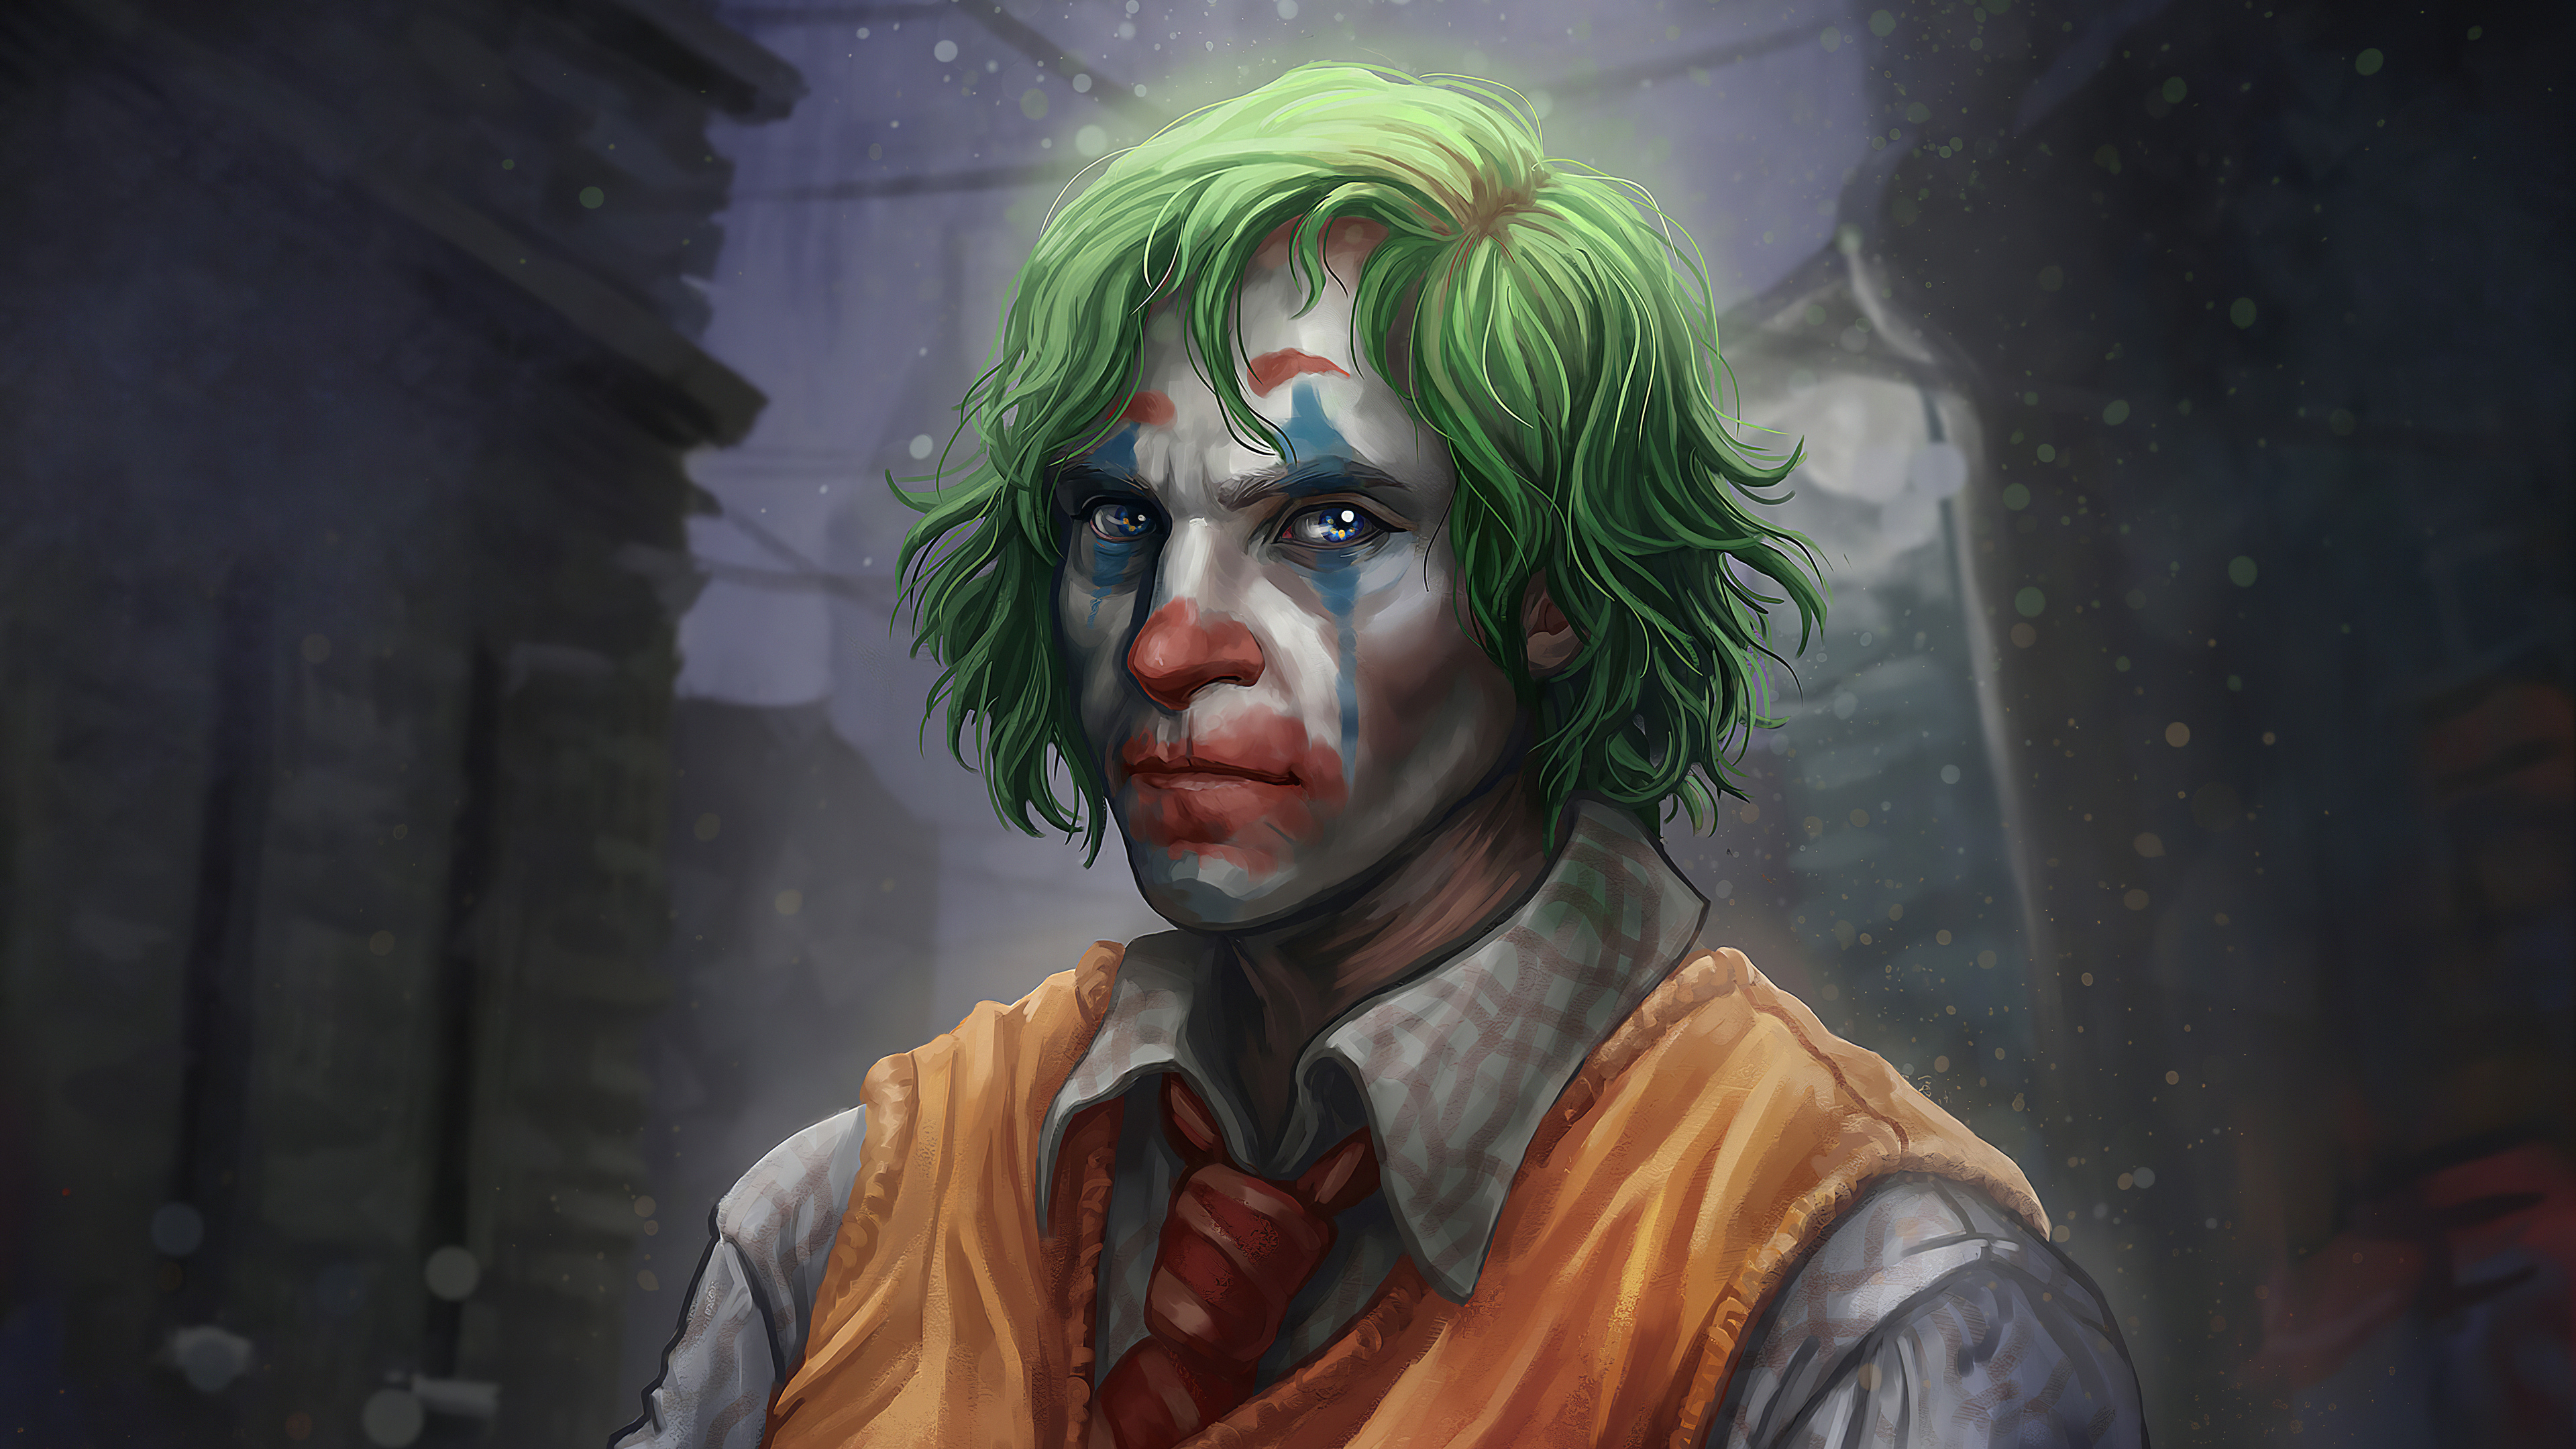 joker art 2020 1580587437 - Joker Art 2020 - Joker Art 2020 wallpapers, Joker Art 2020 art wallpapers, Joker Art 2020 4k wallpapers